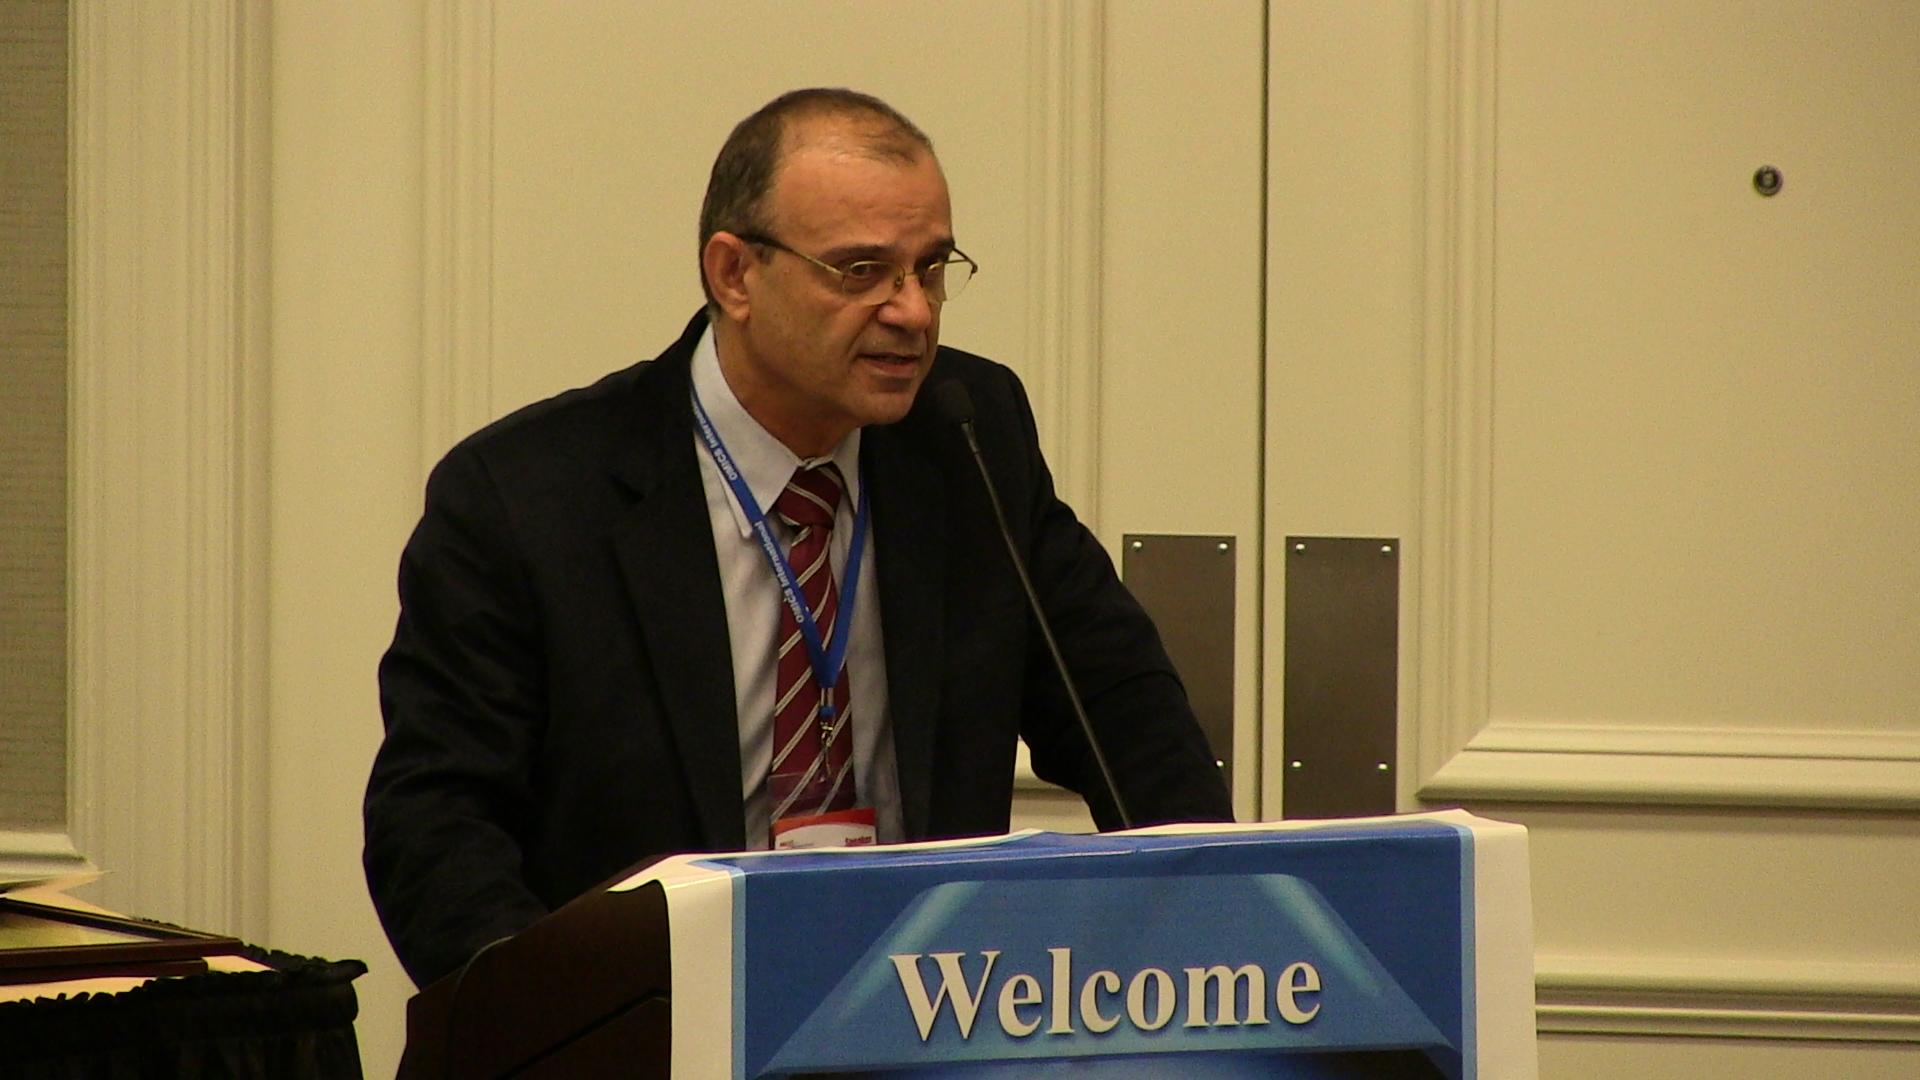 Mauricio Laerte Silva